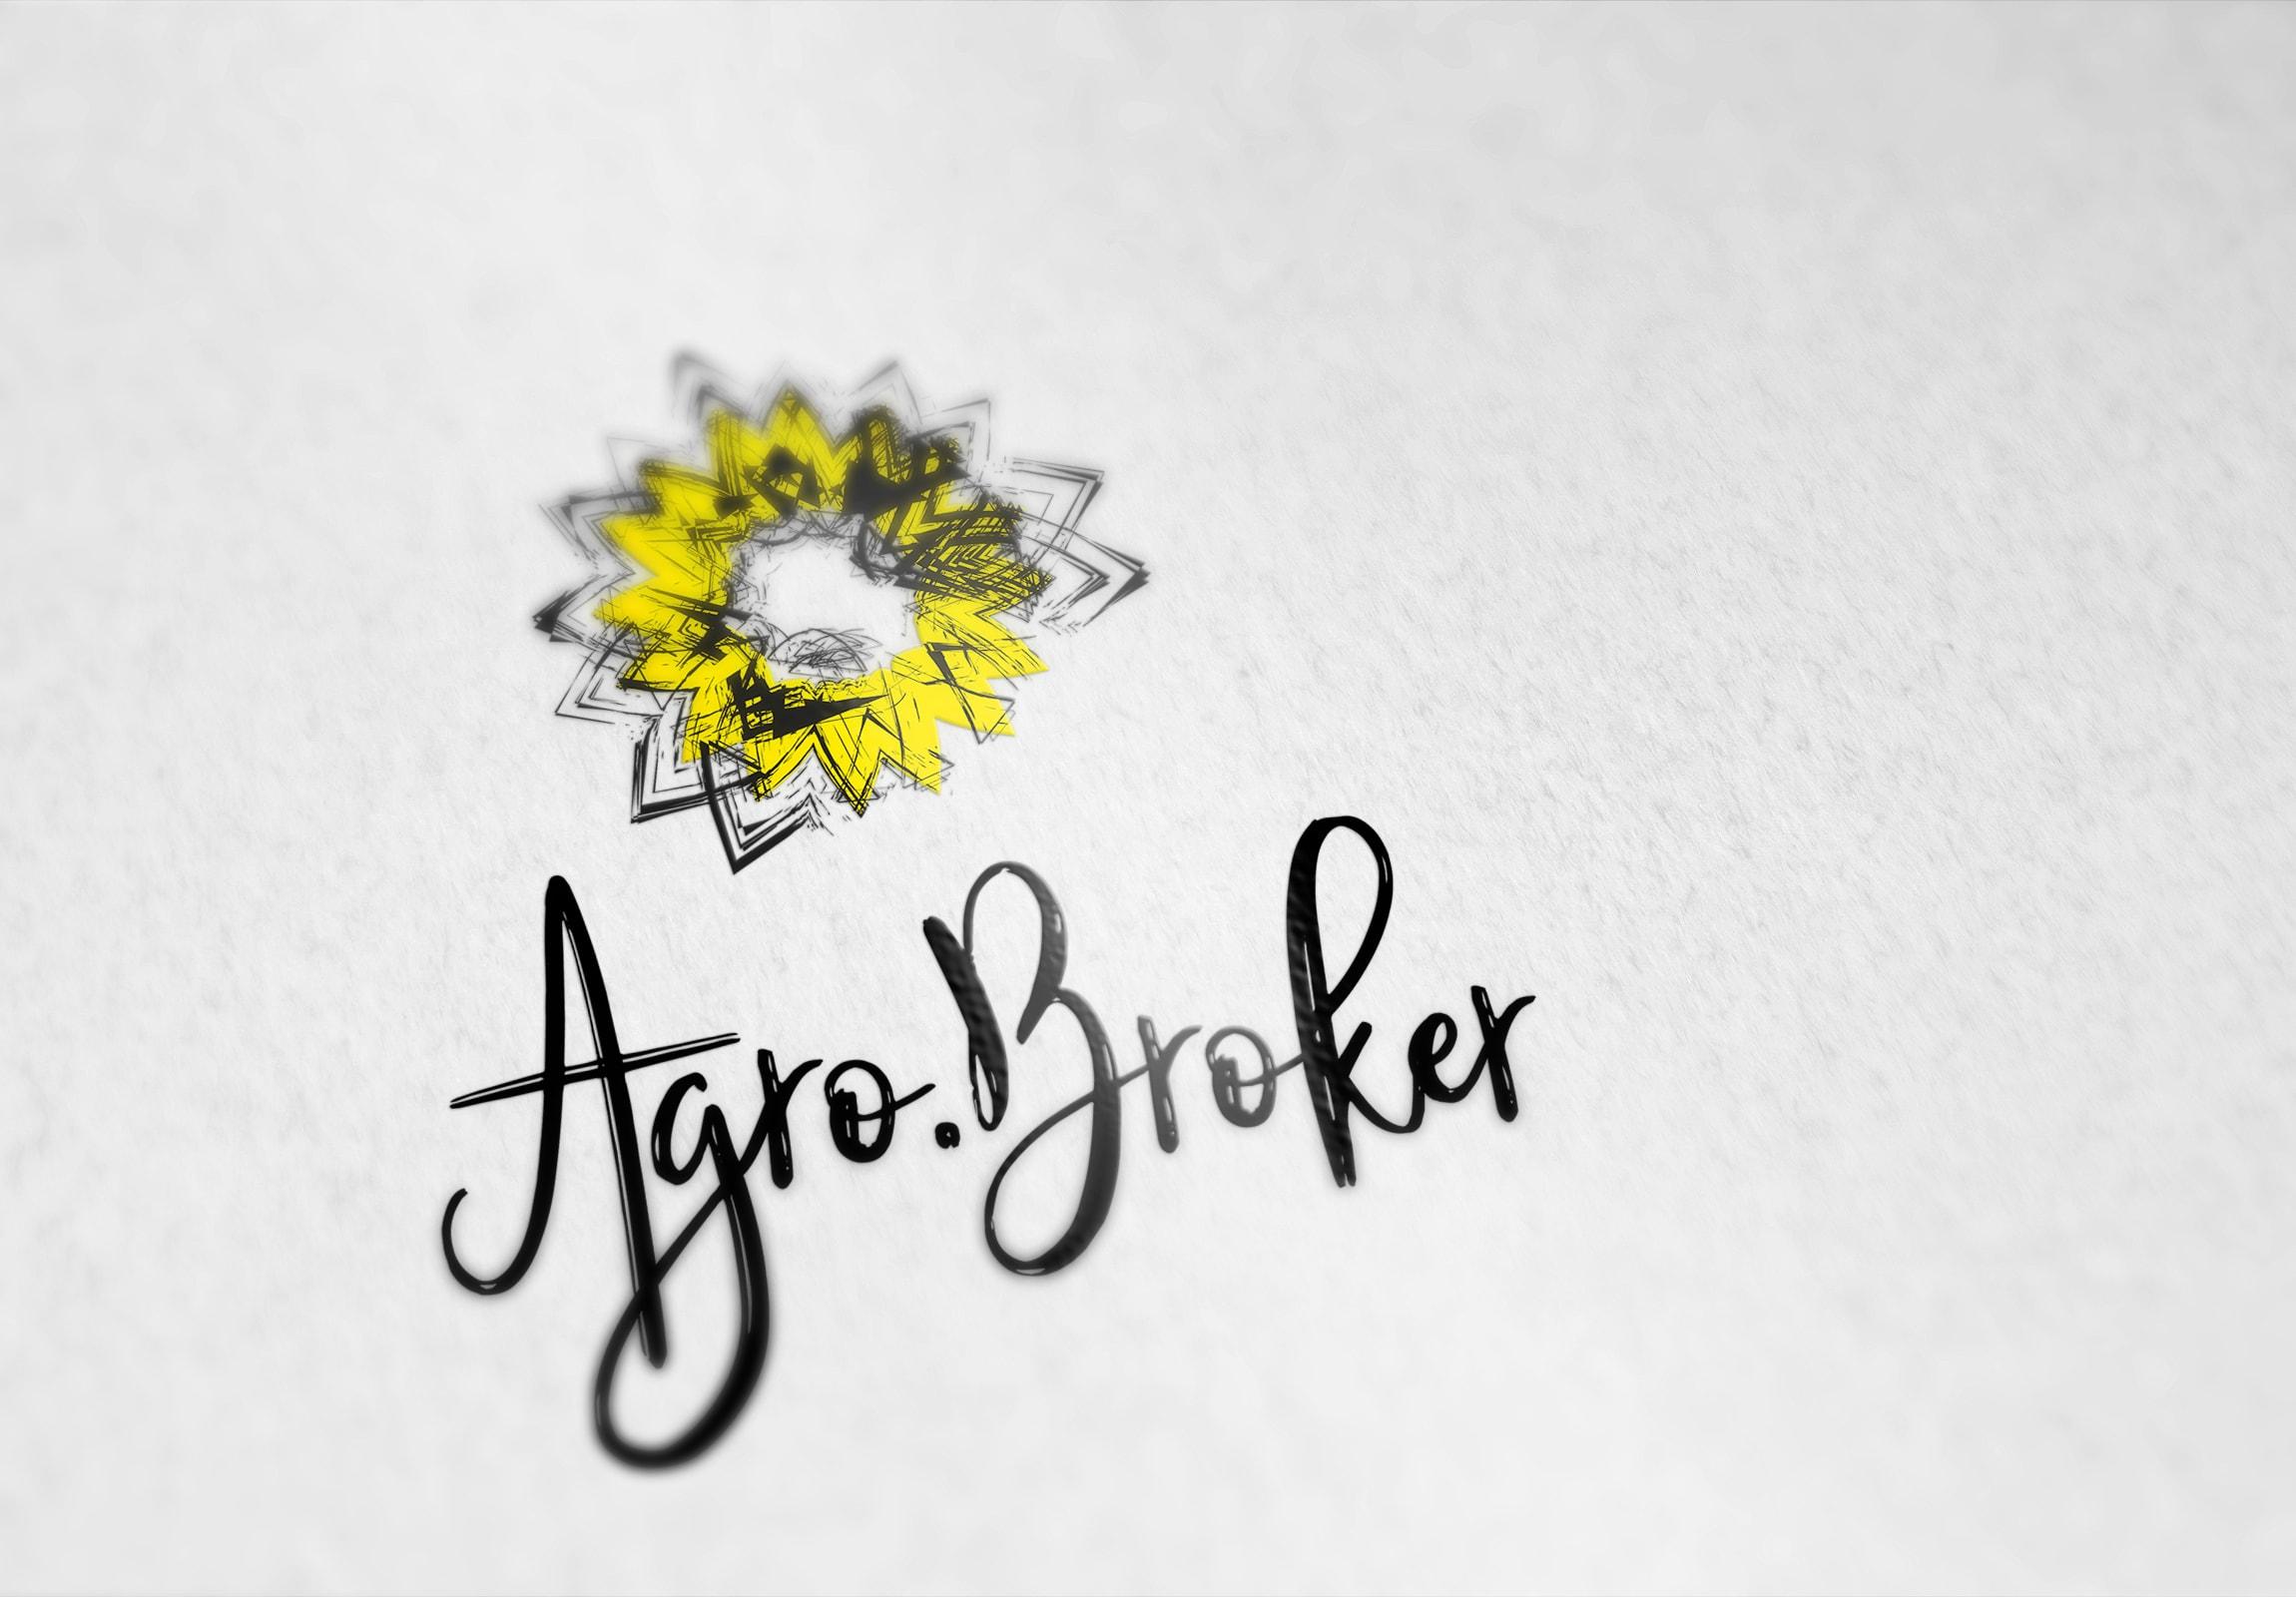 ТЗ на разработку пакета айдентики Agro.Broker фото f_8415971df186915c.jpg